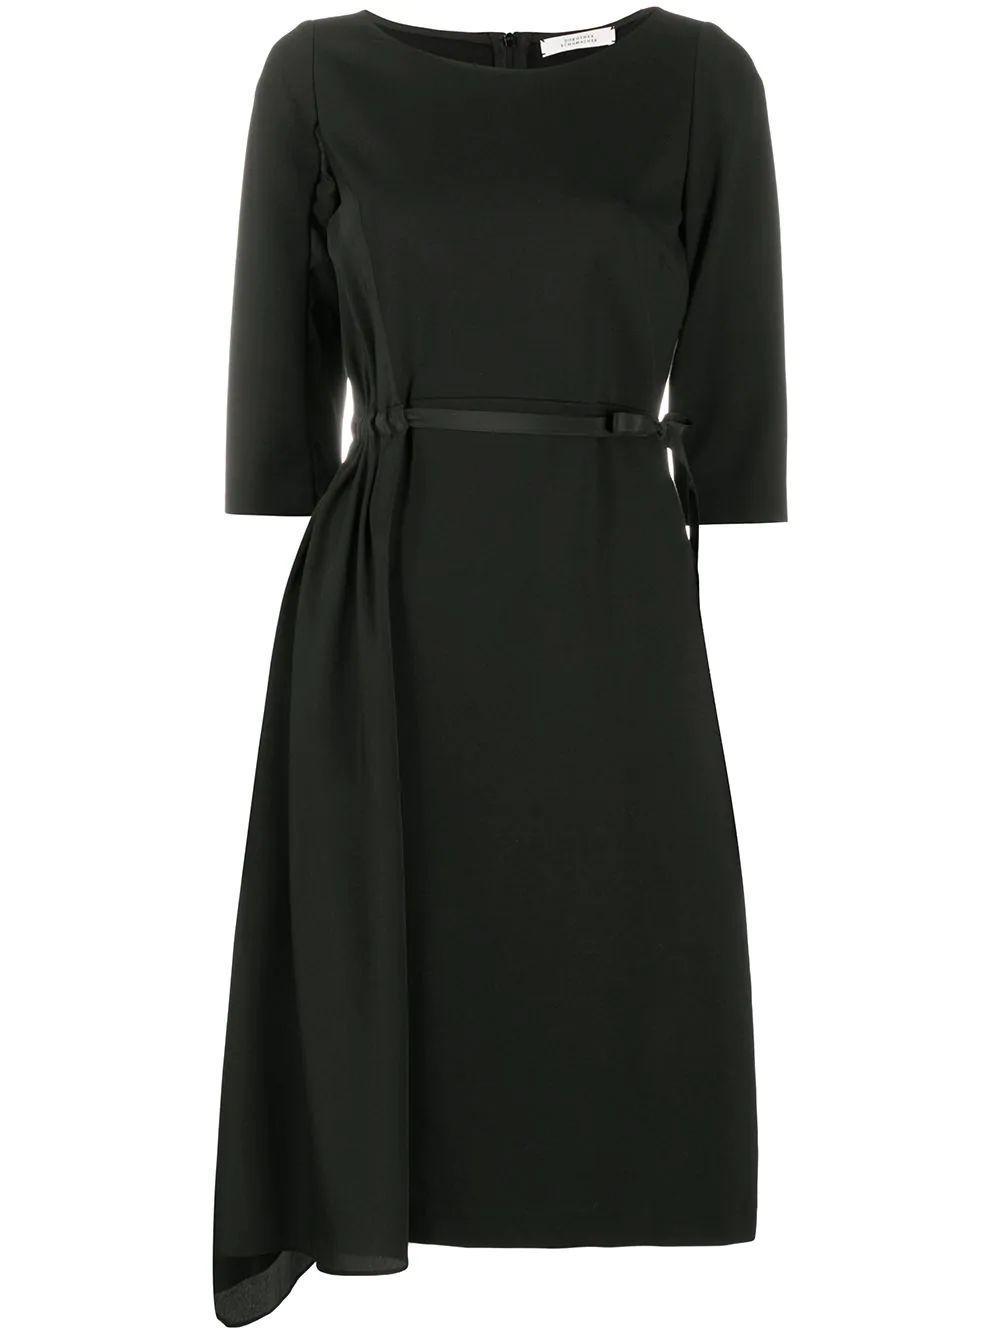 Emotional Essence Dress Item # 948014